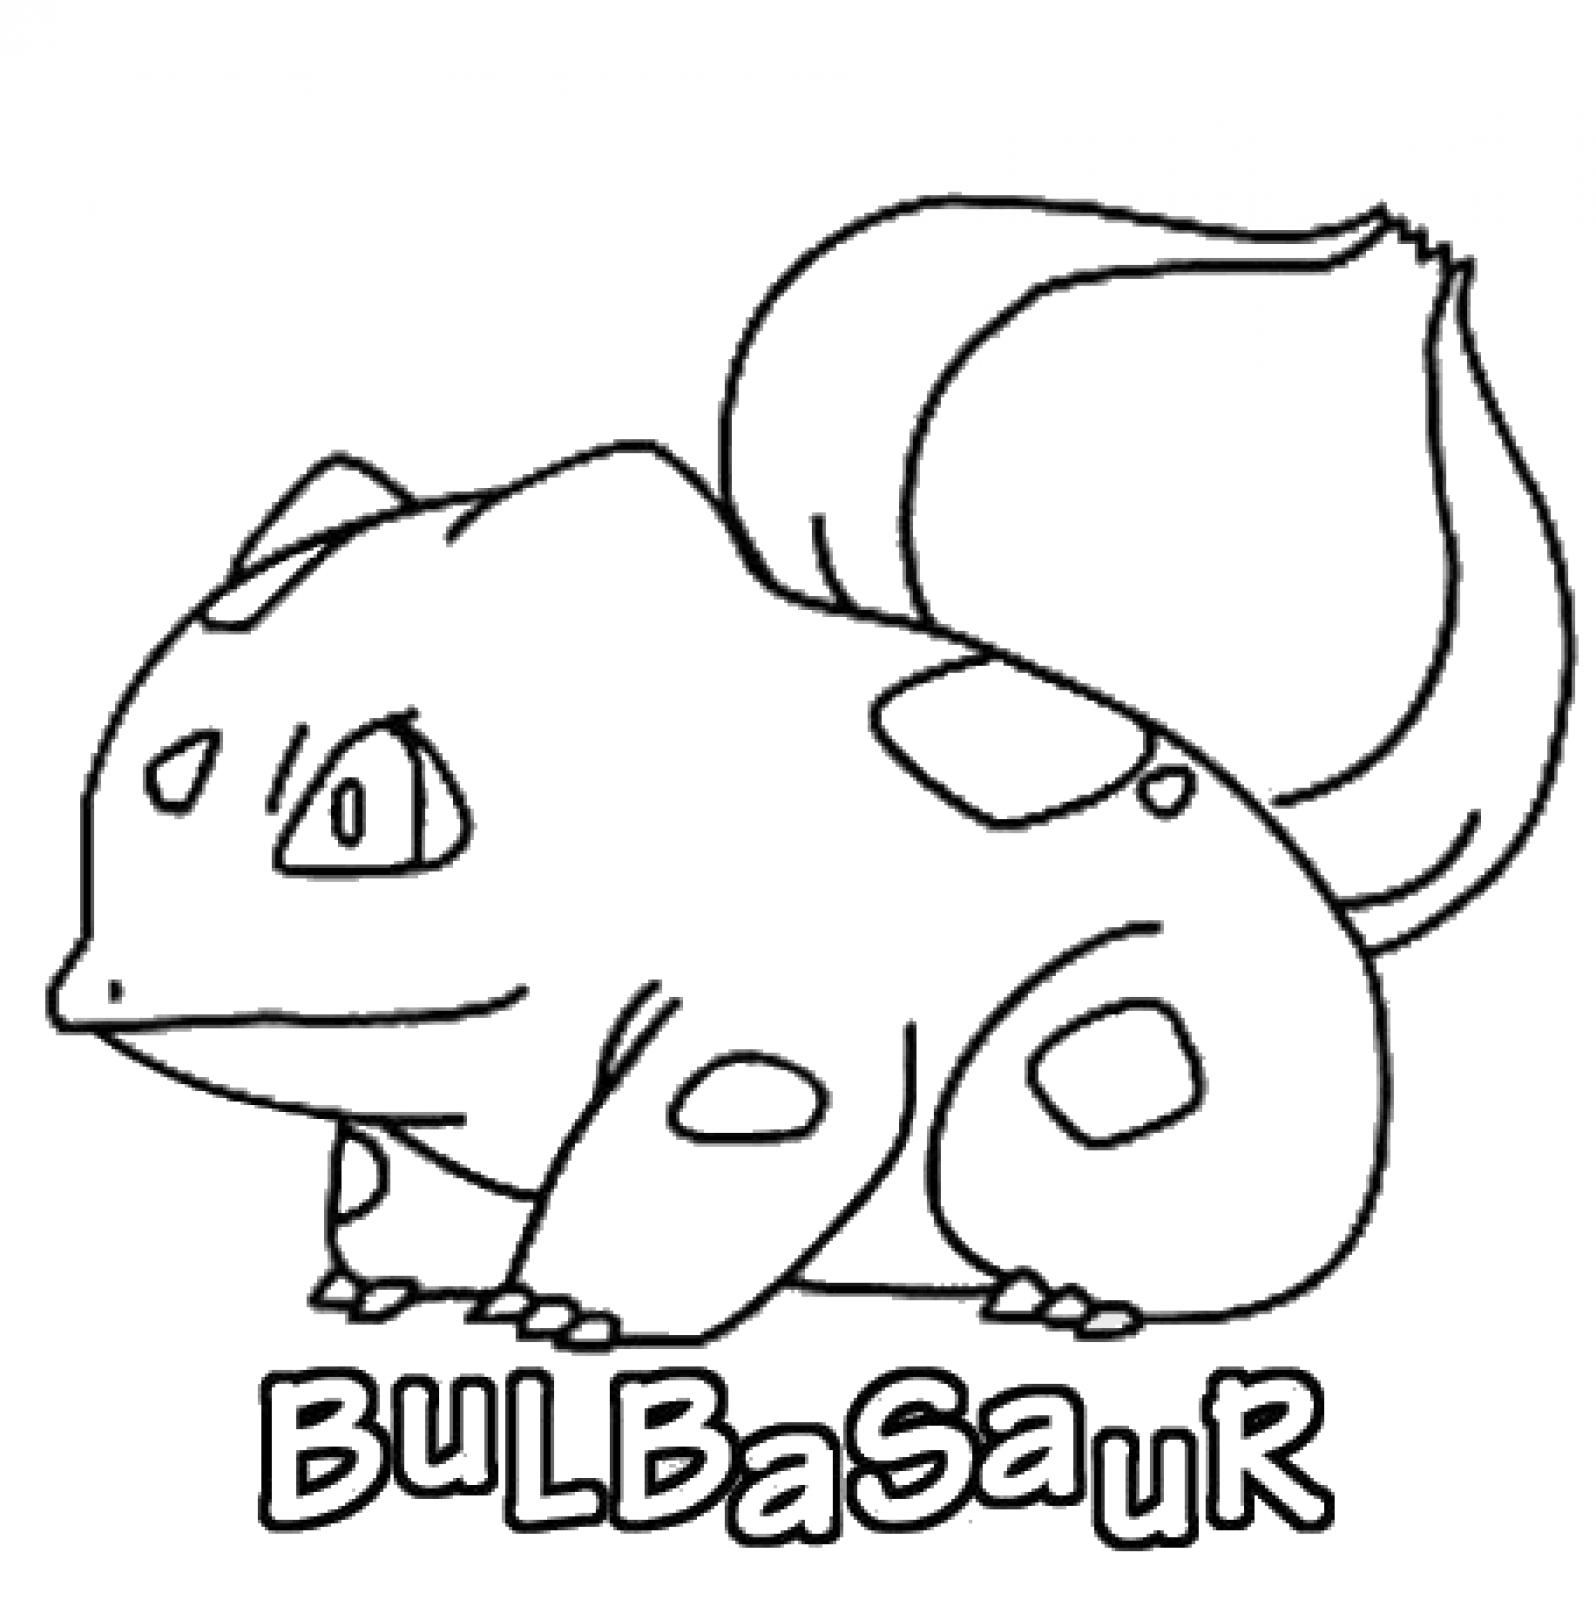 Pokemon Coloring Pages To Print Pokemon Bulbasaur Printable Coloring Pages Extra Coloring Pa Cartoon Coloring Pages Pokemon Coloring Pages Pixel Art Pokemon